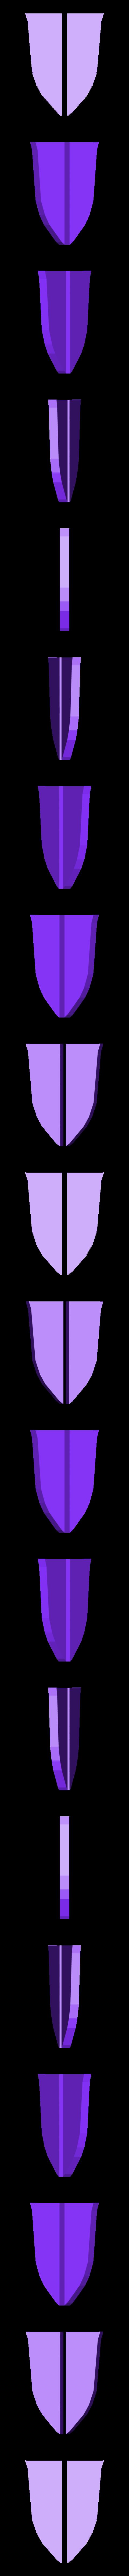 DarliFra_badge_outers.stl Download free STL file Darling in the Franxx Badge • 3D printing design, sh0rt_stak